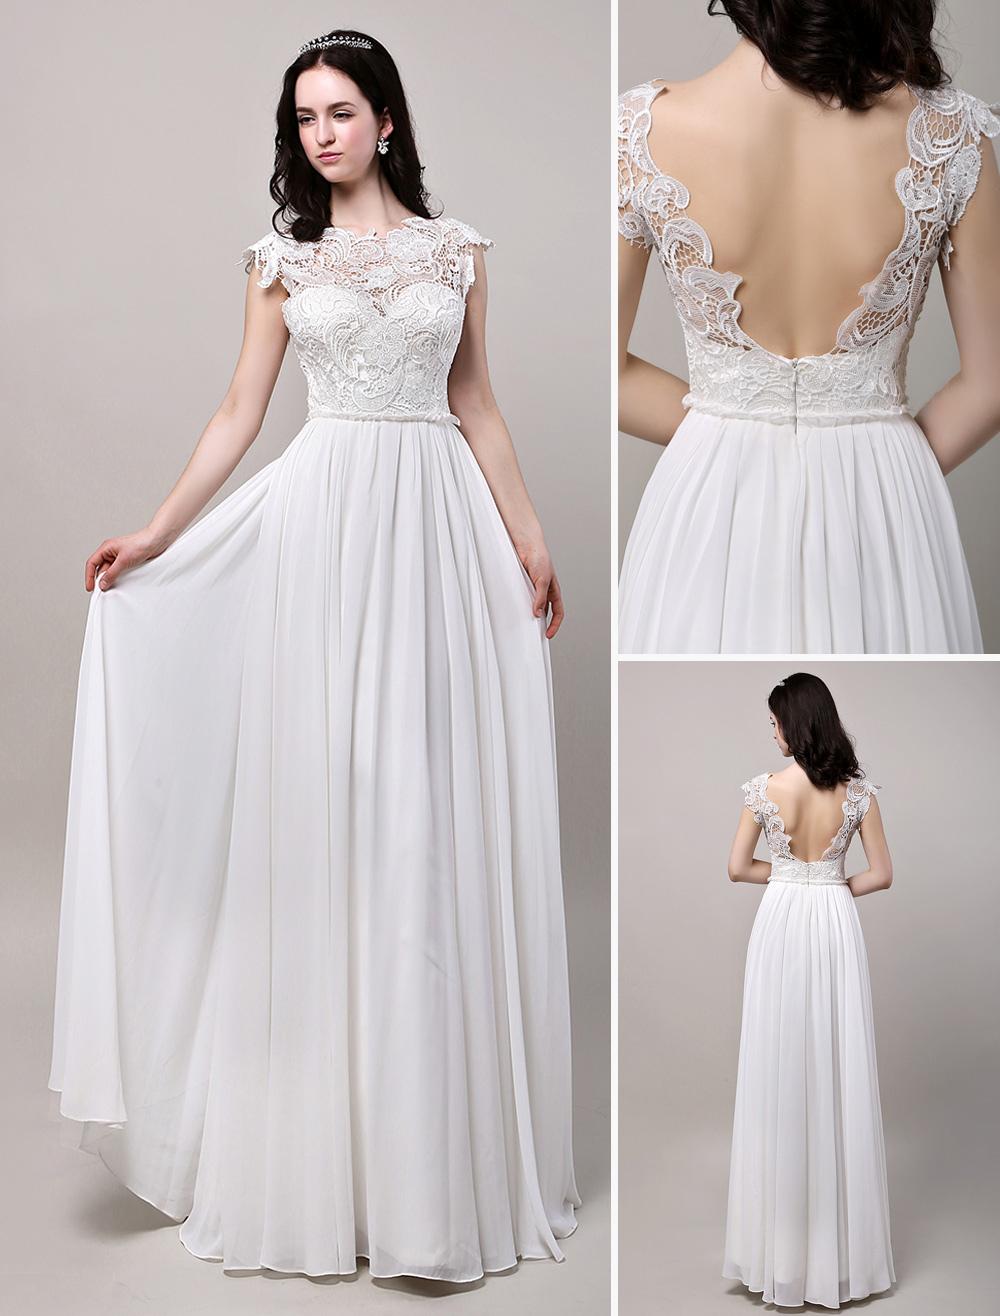 Backless Lace Chiffon Beach Boho Bridal Gown